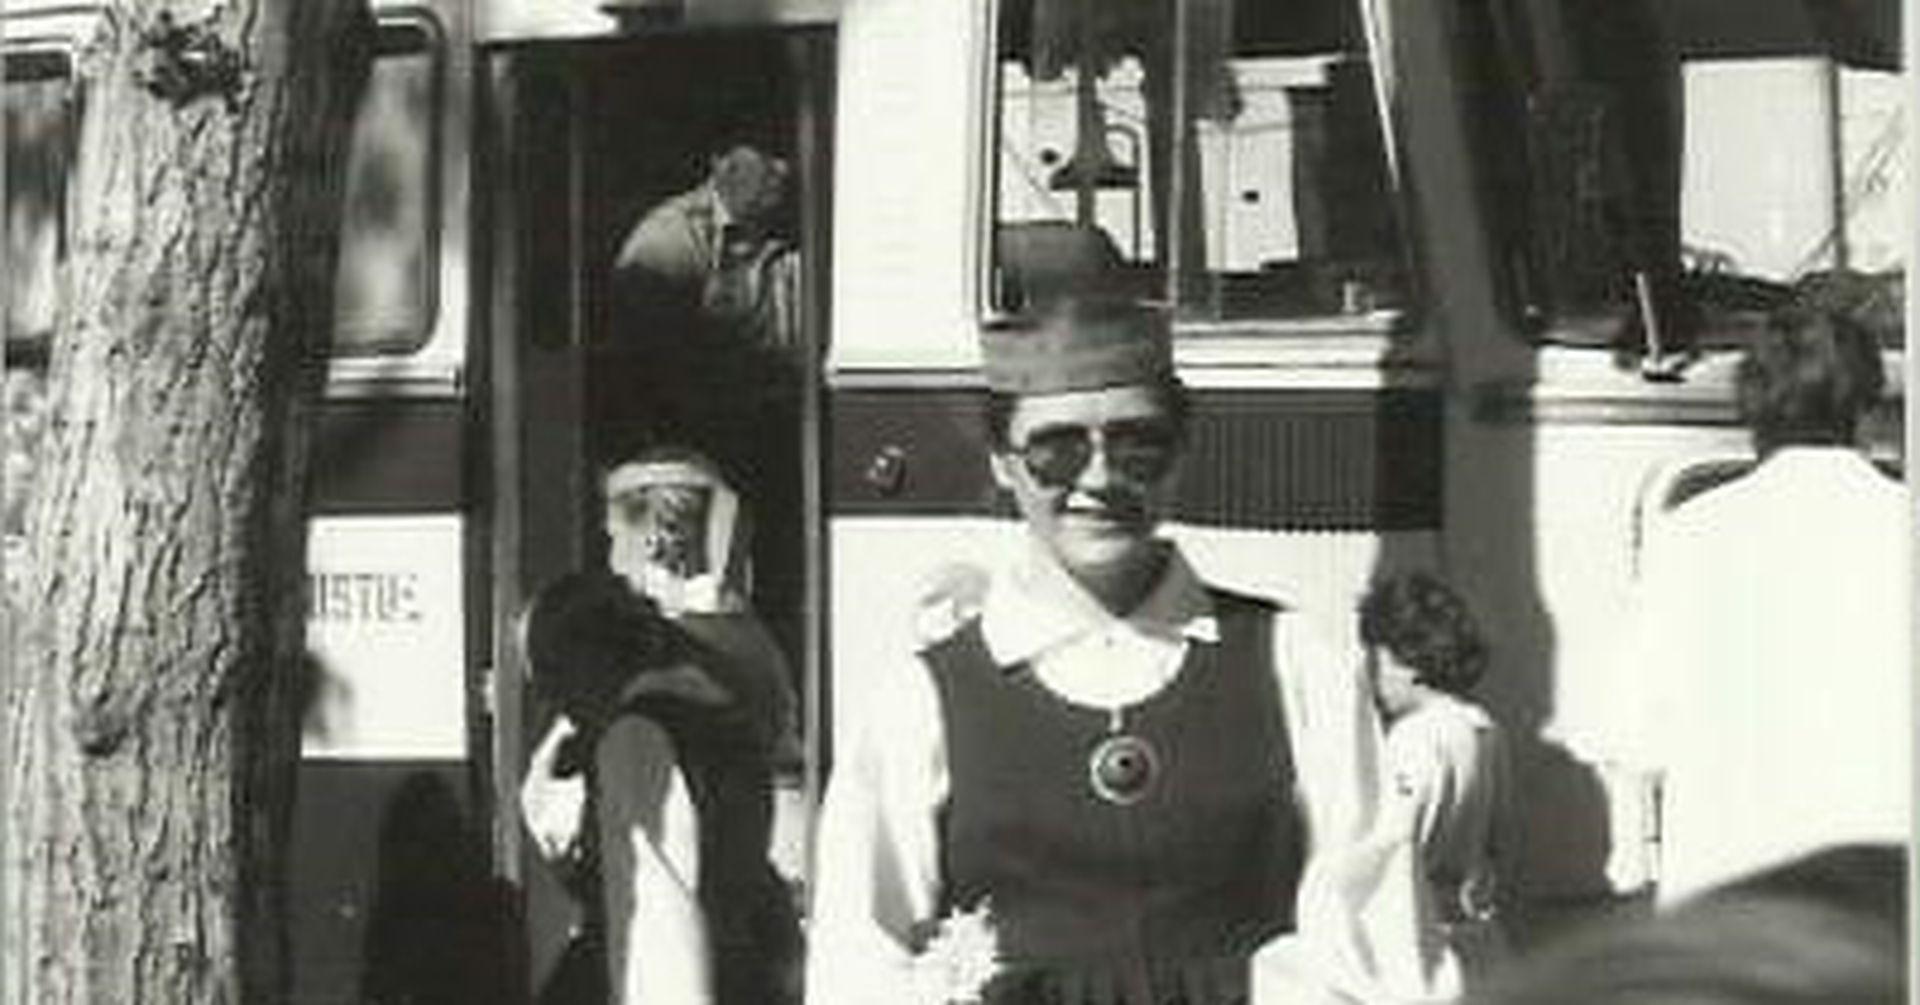 Lia Olljum en Tallinn, con vestimenta tradicional para participar del festival musical